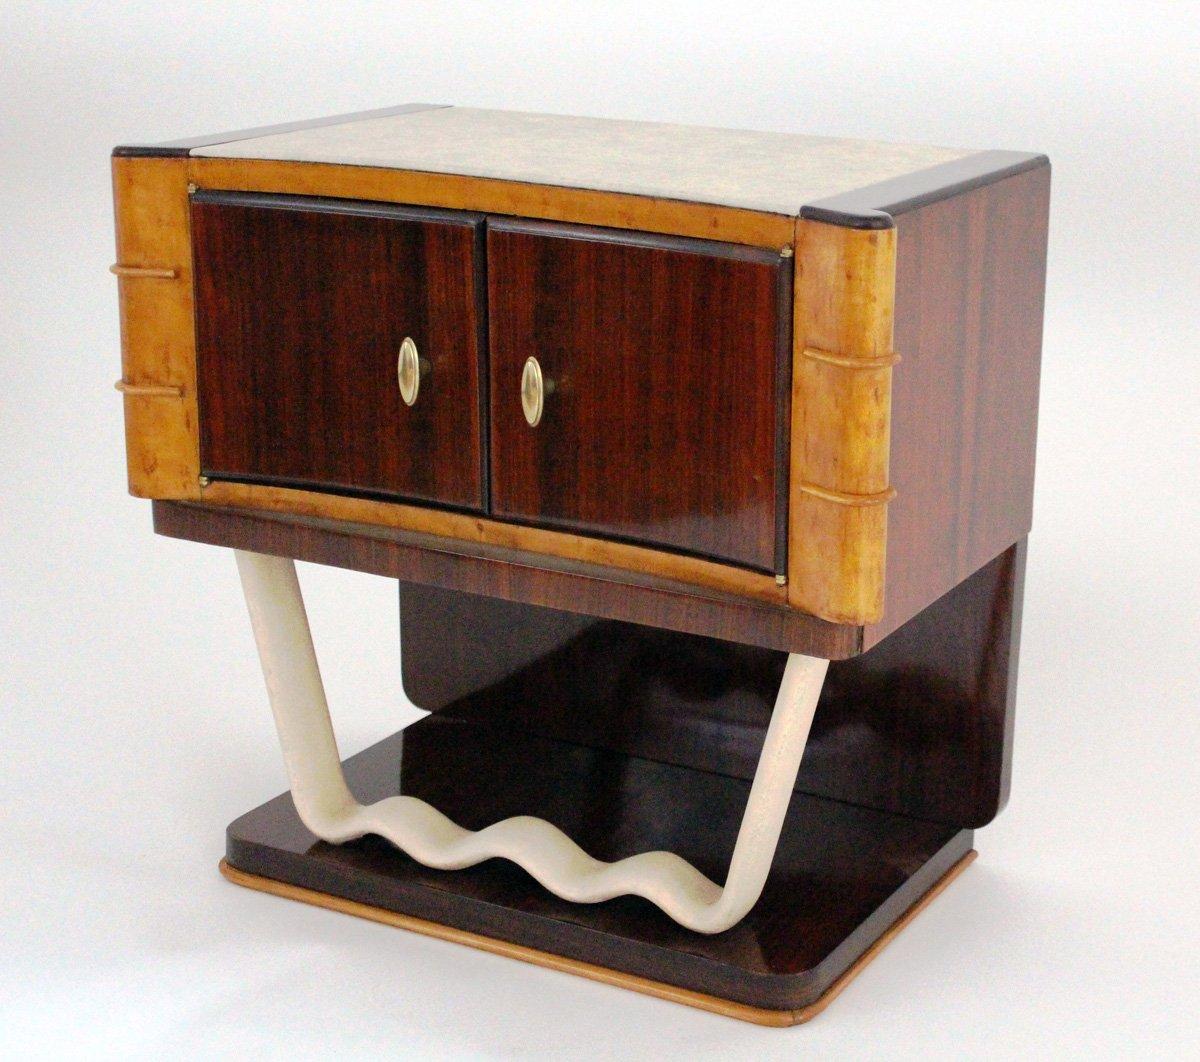 Comodini vintage di osvaldo borsani per mobili trieste for Mobilia trieste